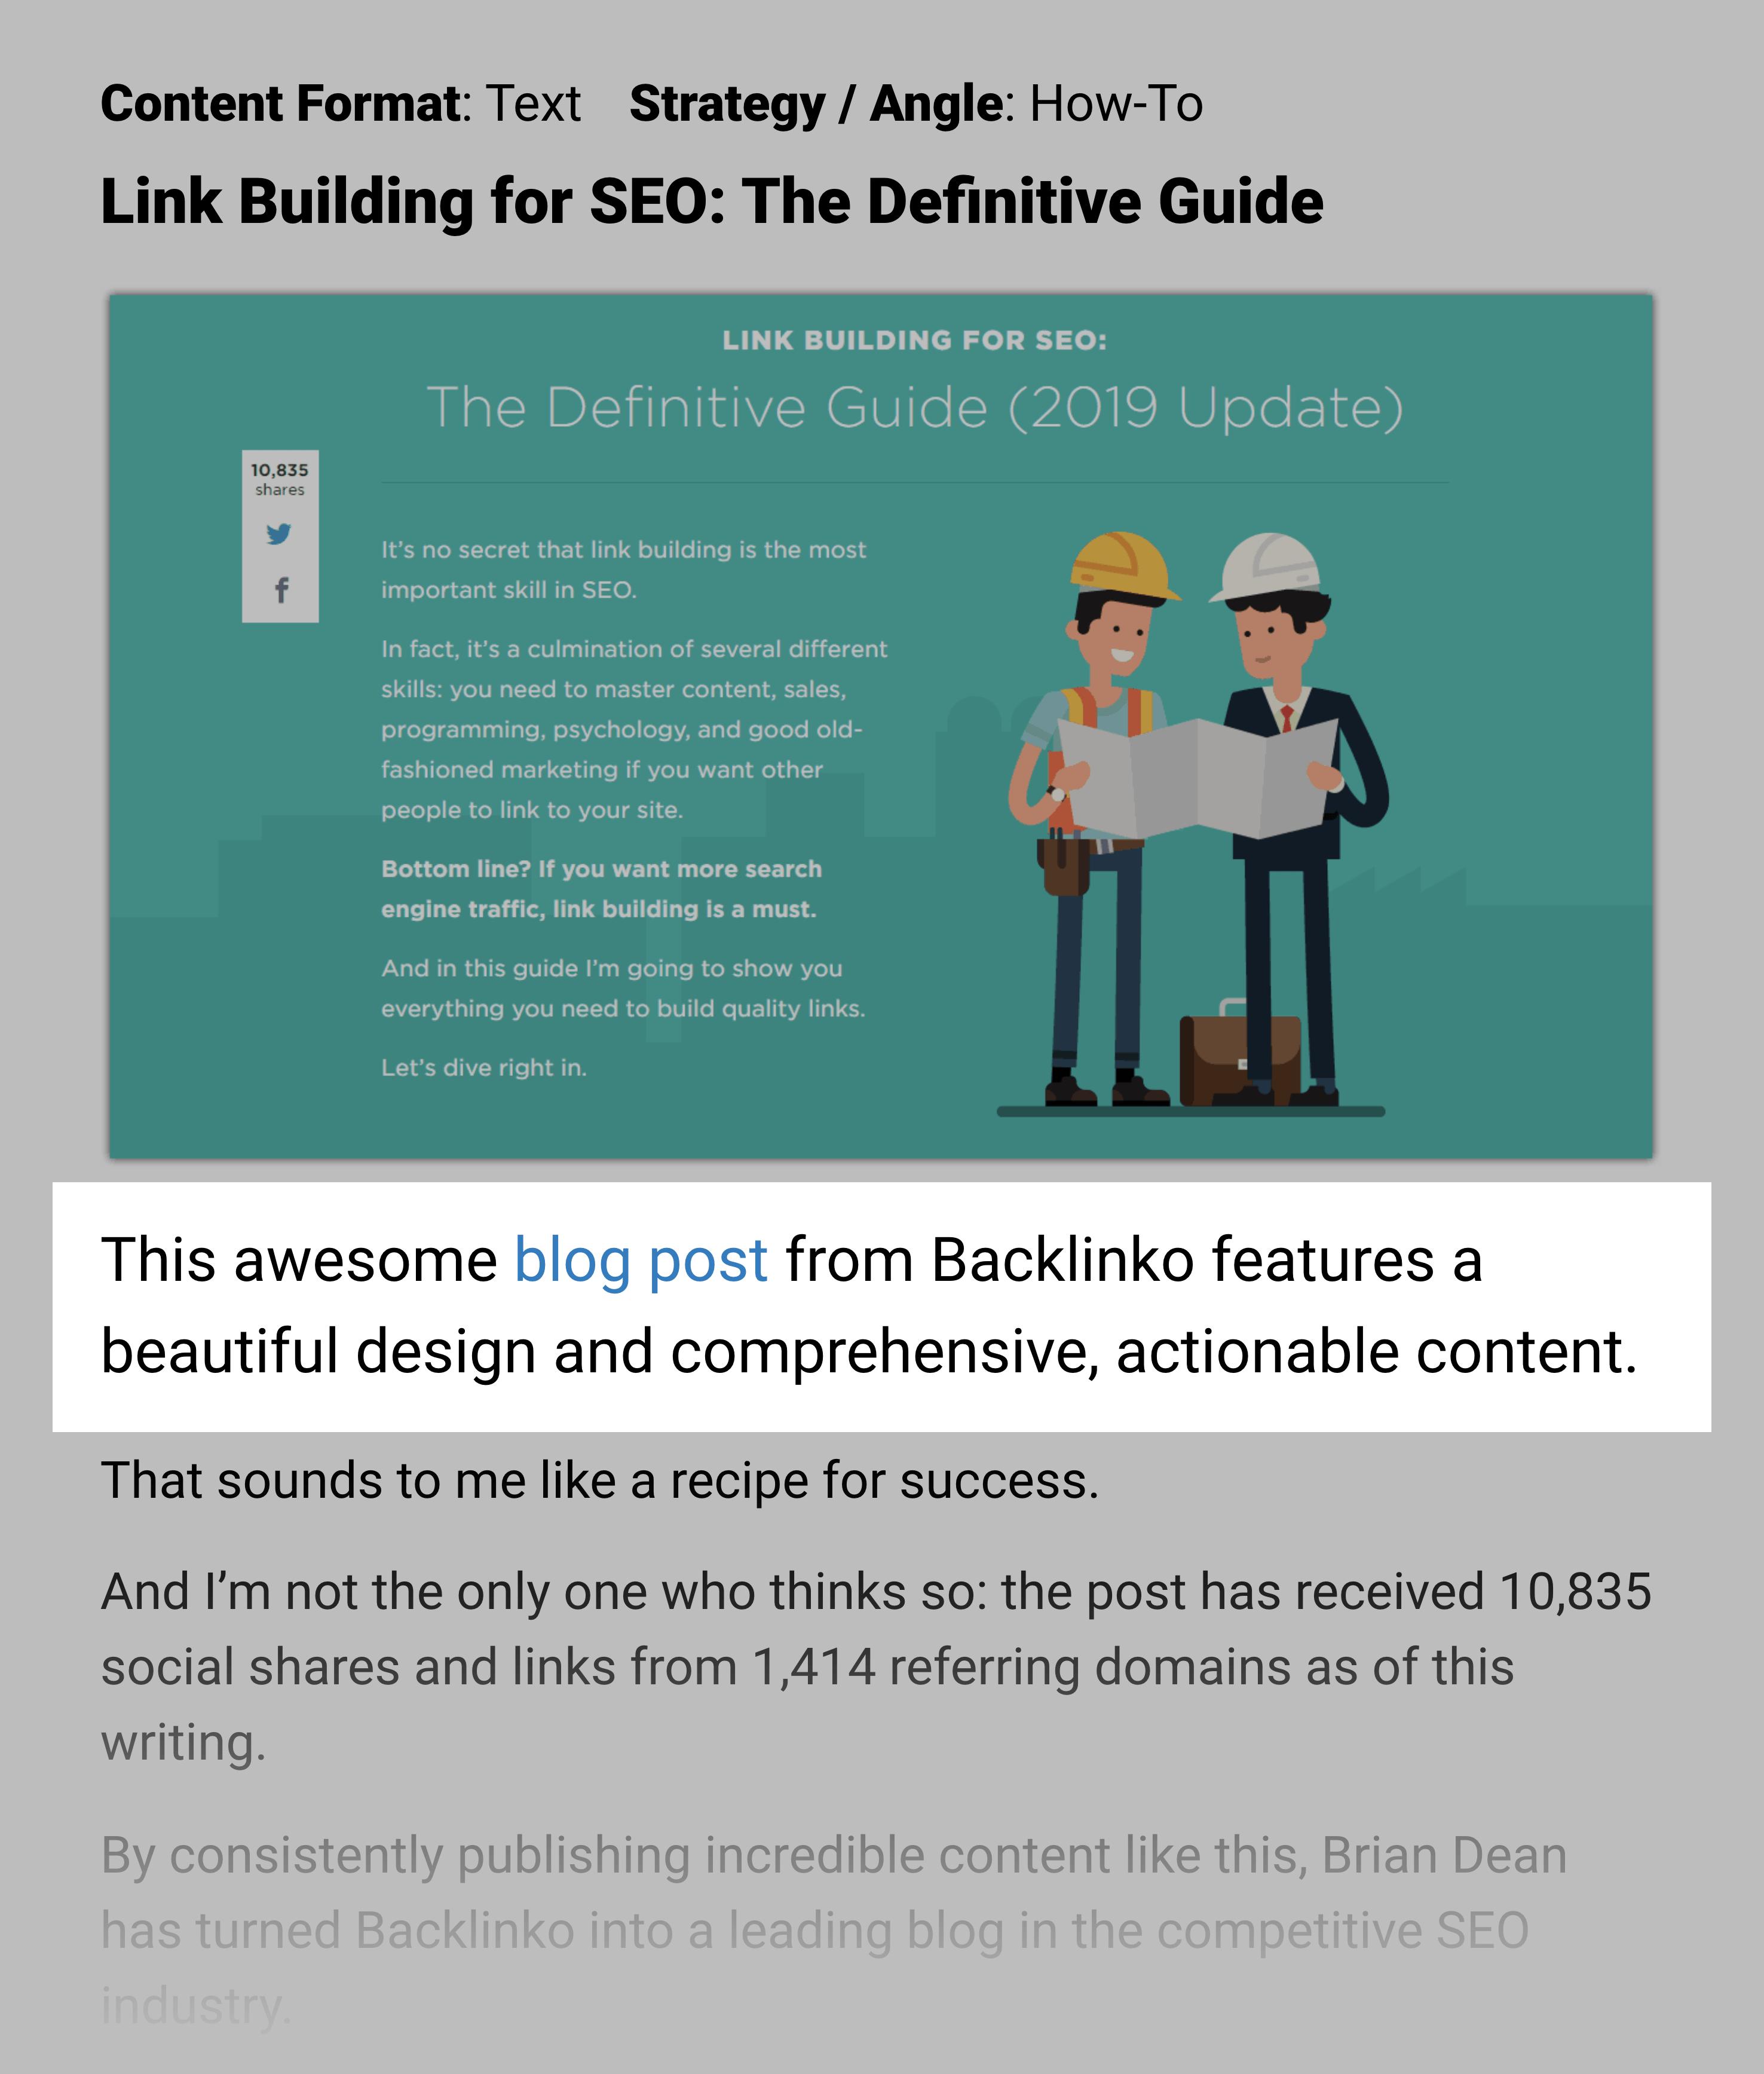 Backlinko Post Design Cited By Growthbadger